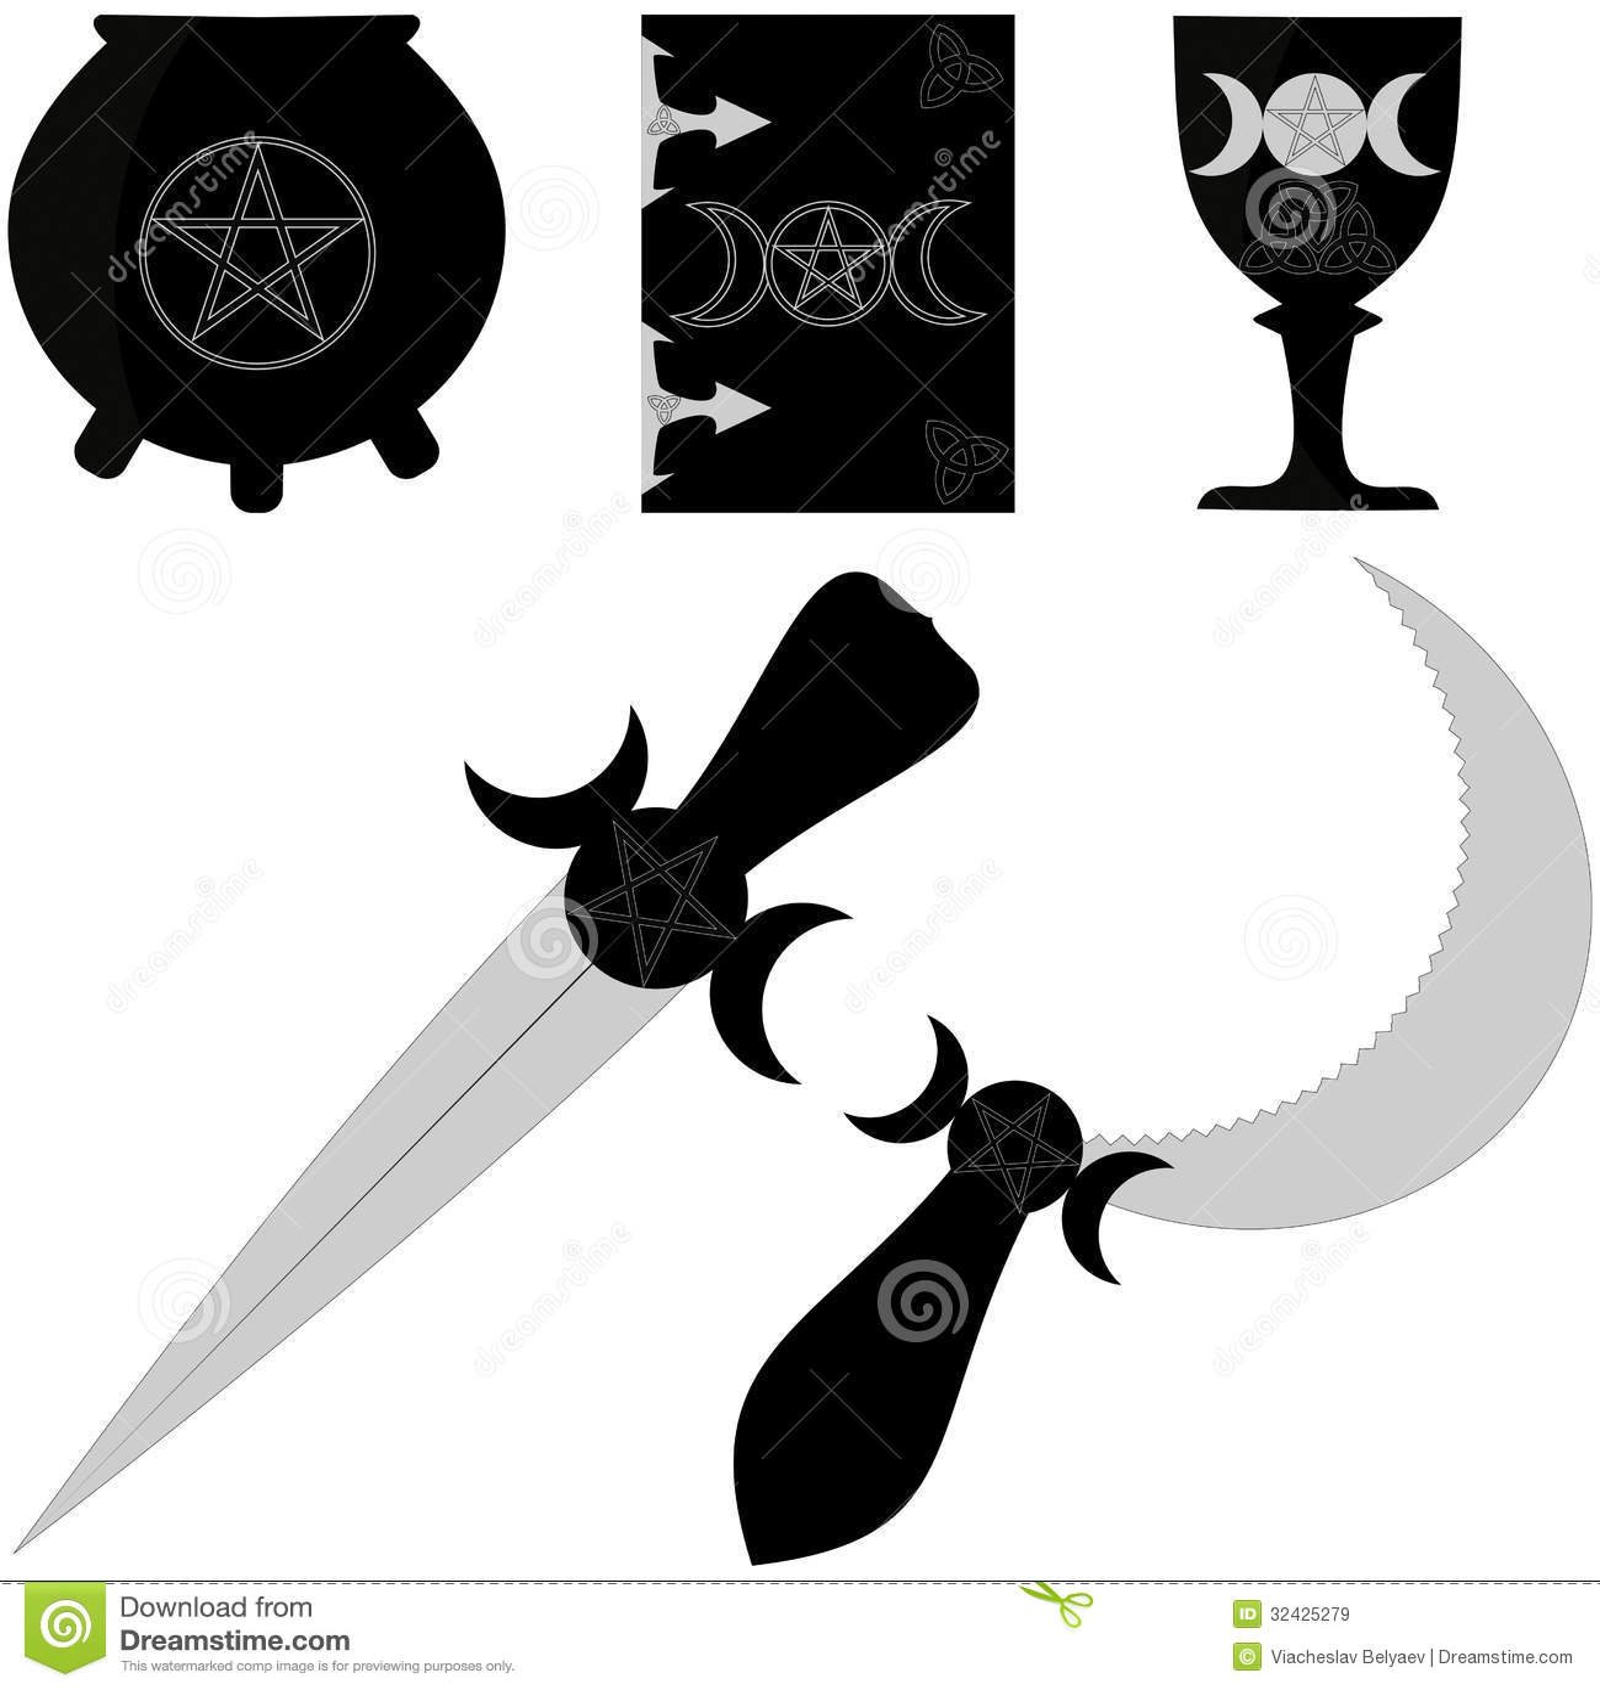 Wiccan God Symbol More Information Djekova